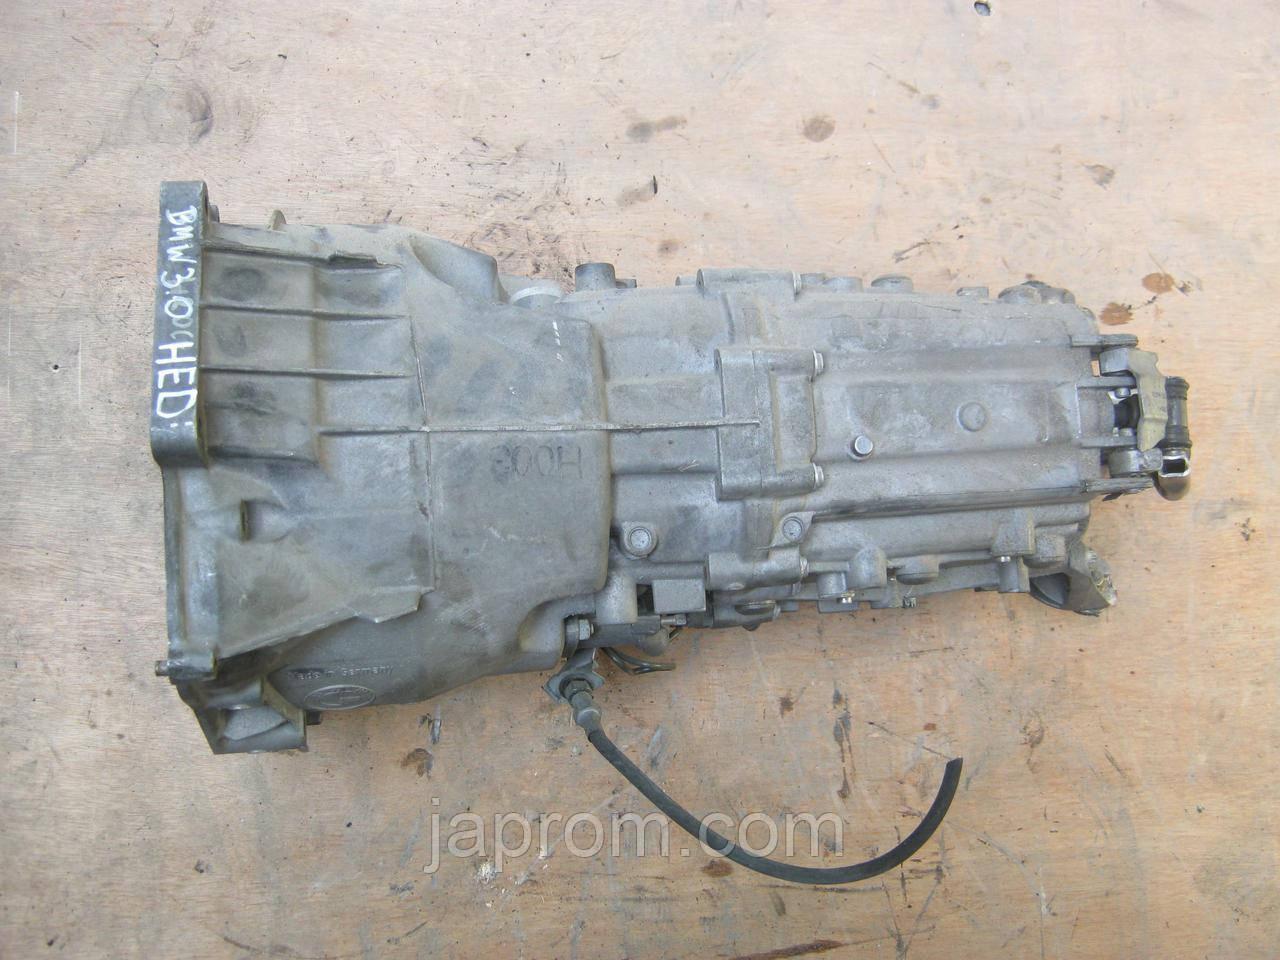 МКПП механічна коробка передач BMW serii 3 E46, E90 2.0 D M57 HED